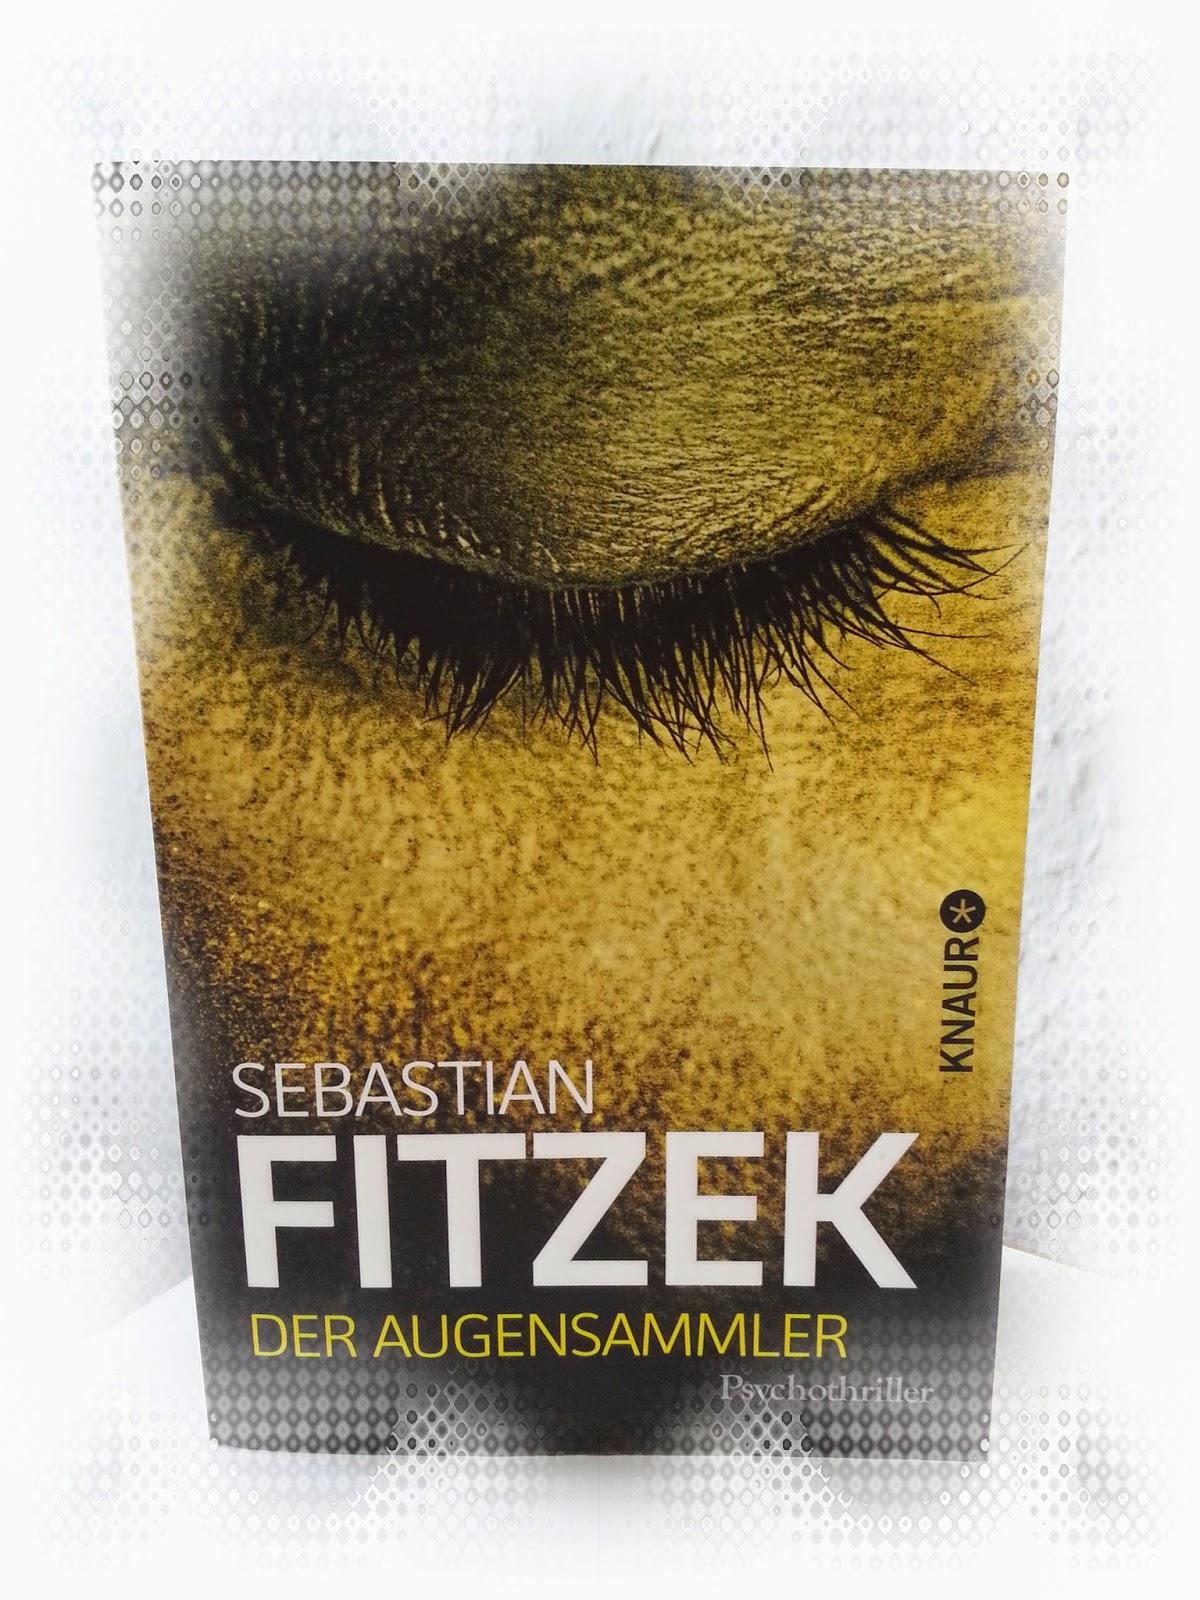 http://www.amazon.de/Augensammler-Psychothriller-Sebastian-Fitzek/dp/3426503751/ref=sr_1_1_bnp_1_pap?s=books&ie=UTF8&qid=1399921383&sr=1-1&keywords=der+augensammler